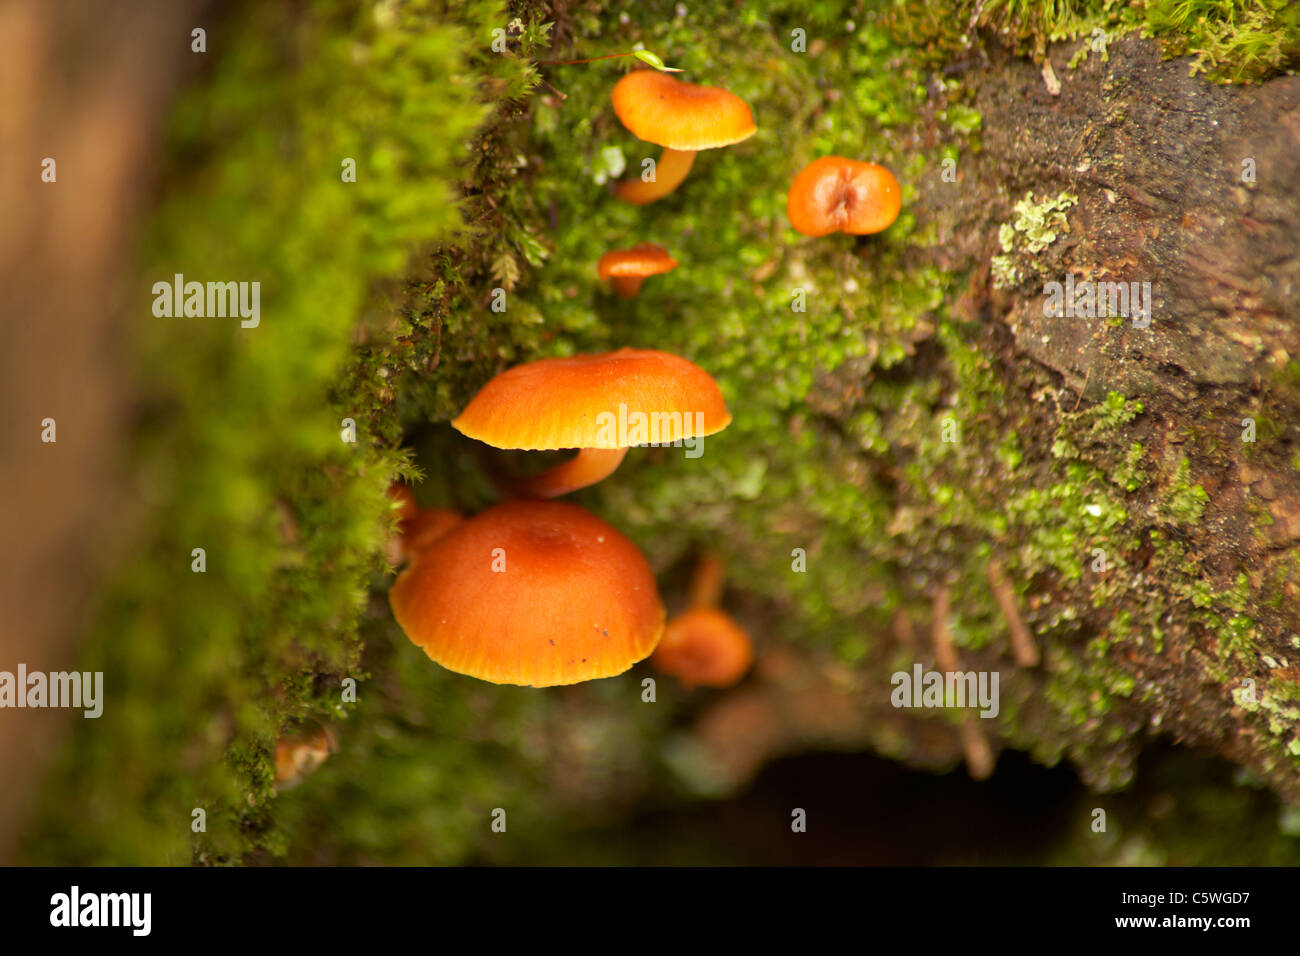 Fungi growing on tree bark - Stock Image